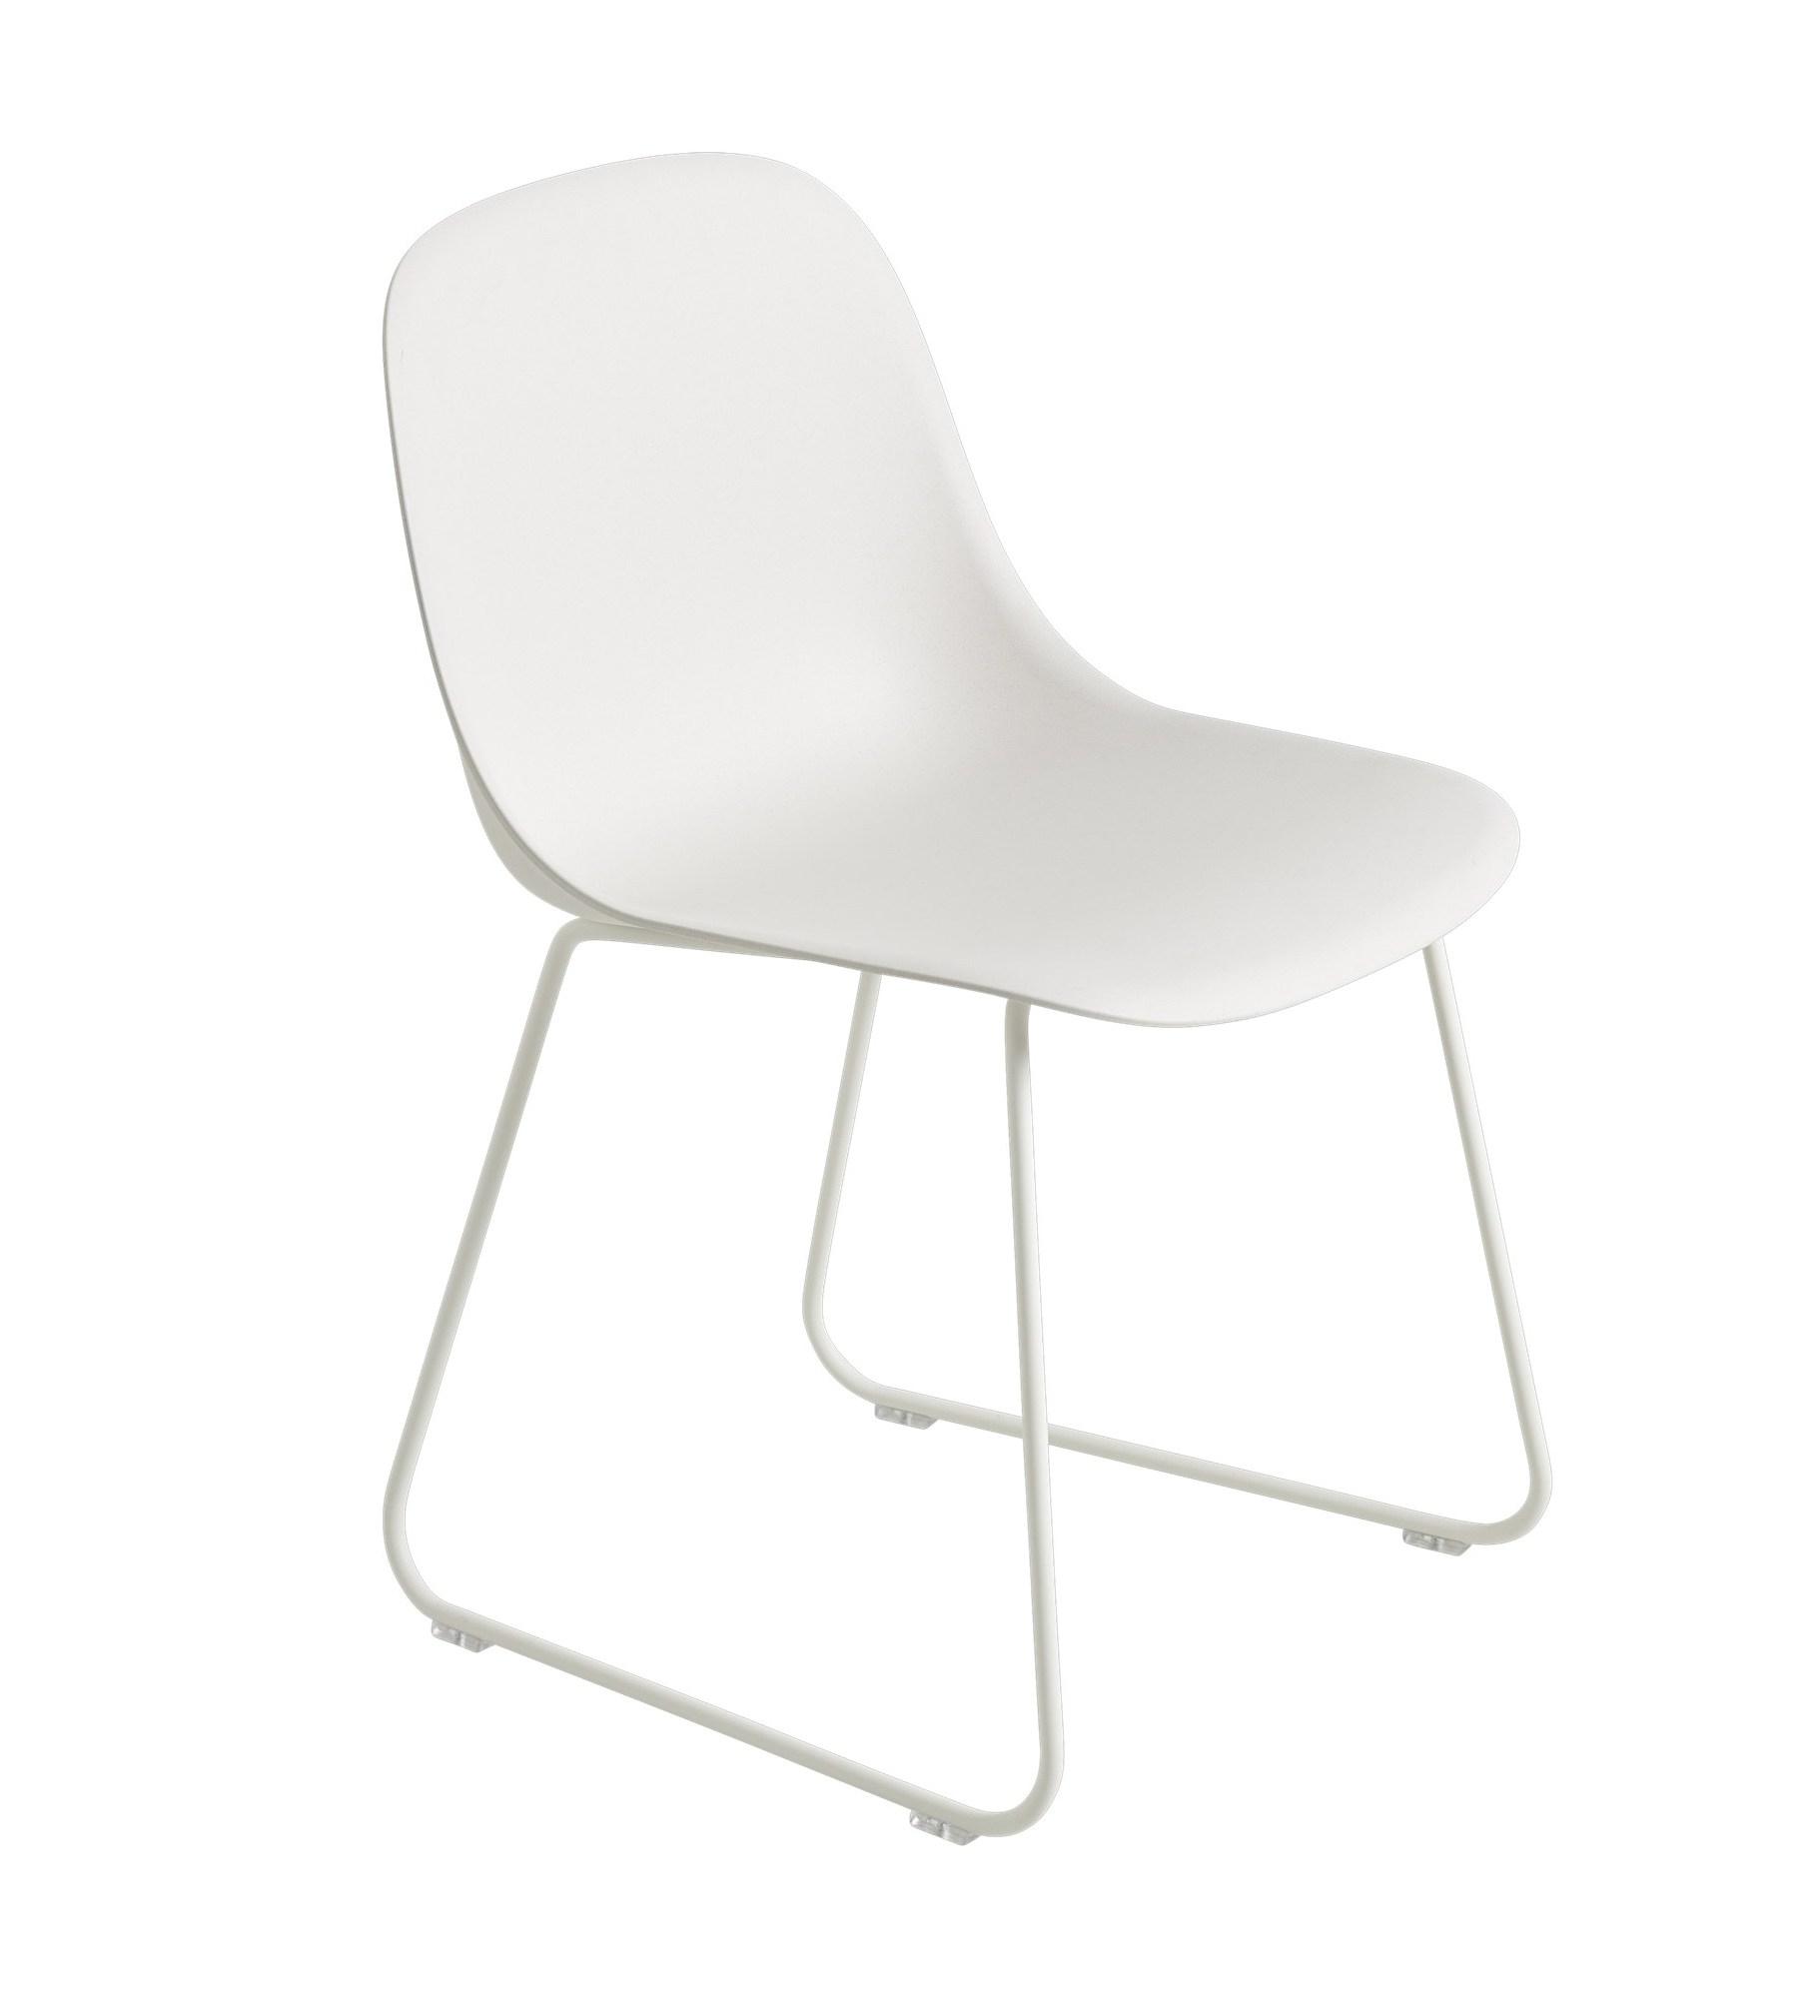 muuto Fiber Side Chair Sled Base weiß